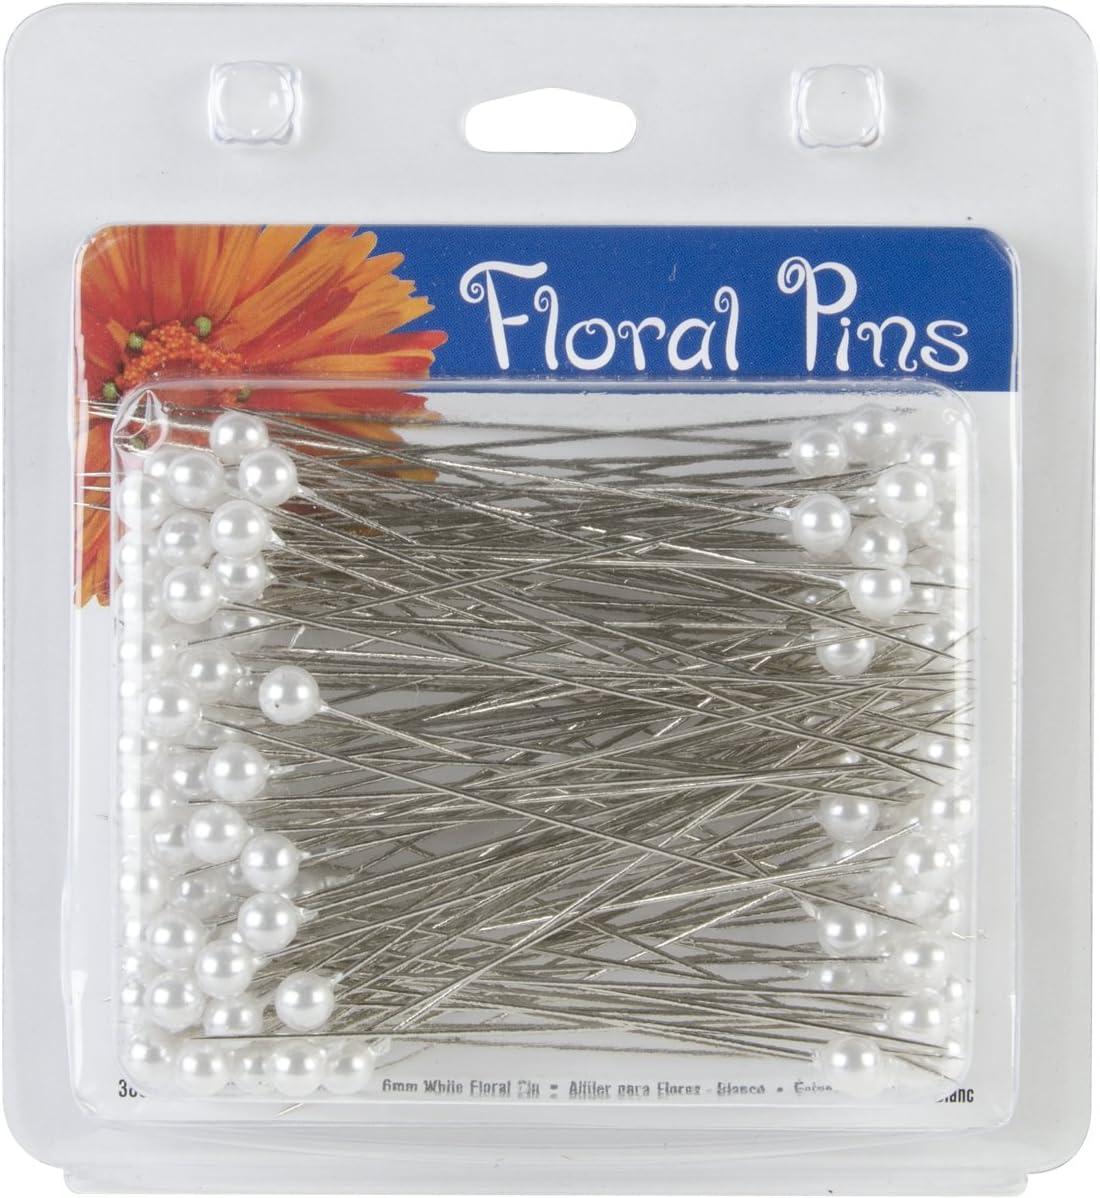 B001C2DPHK Darice 3-Inch Floral Pins, Round, White, 144-Pack 71K8FGgZlmL